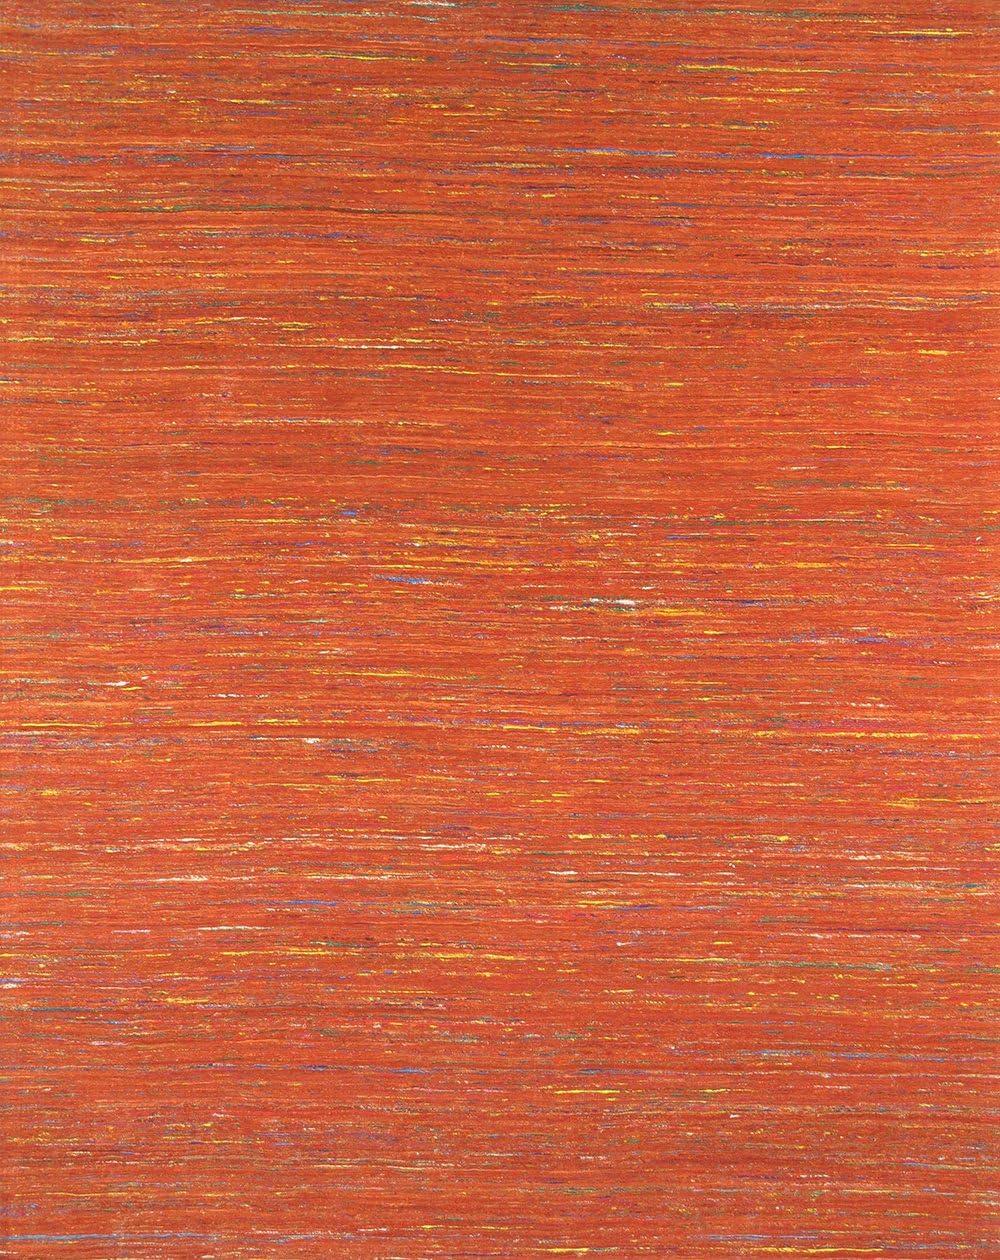 Pasargad Carpets Modern Collection Sari Silk Hand-Loomed Stripe Area Rug, 2 x 3